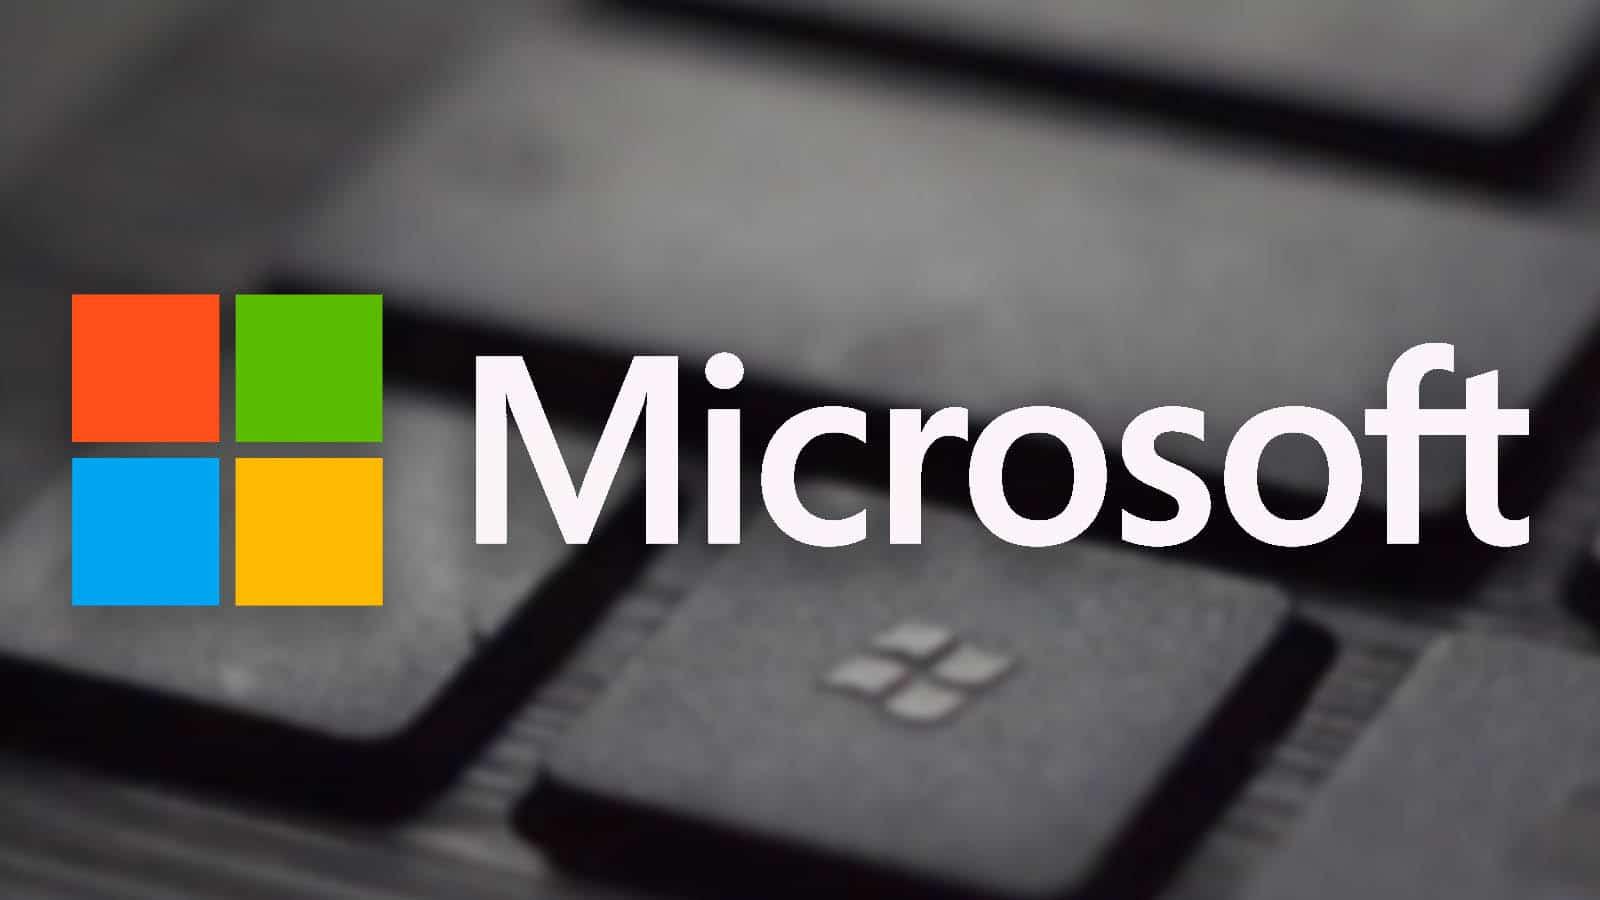 microsoft logo on blurred background